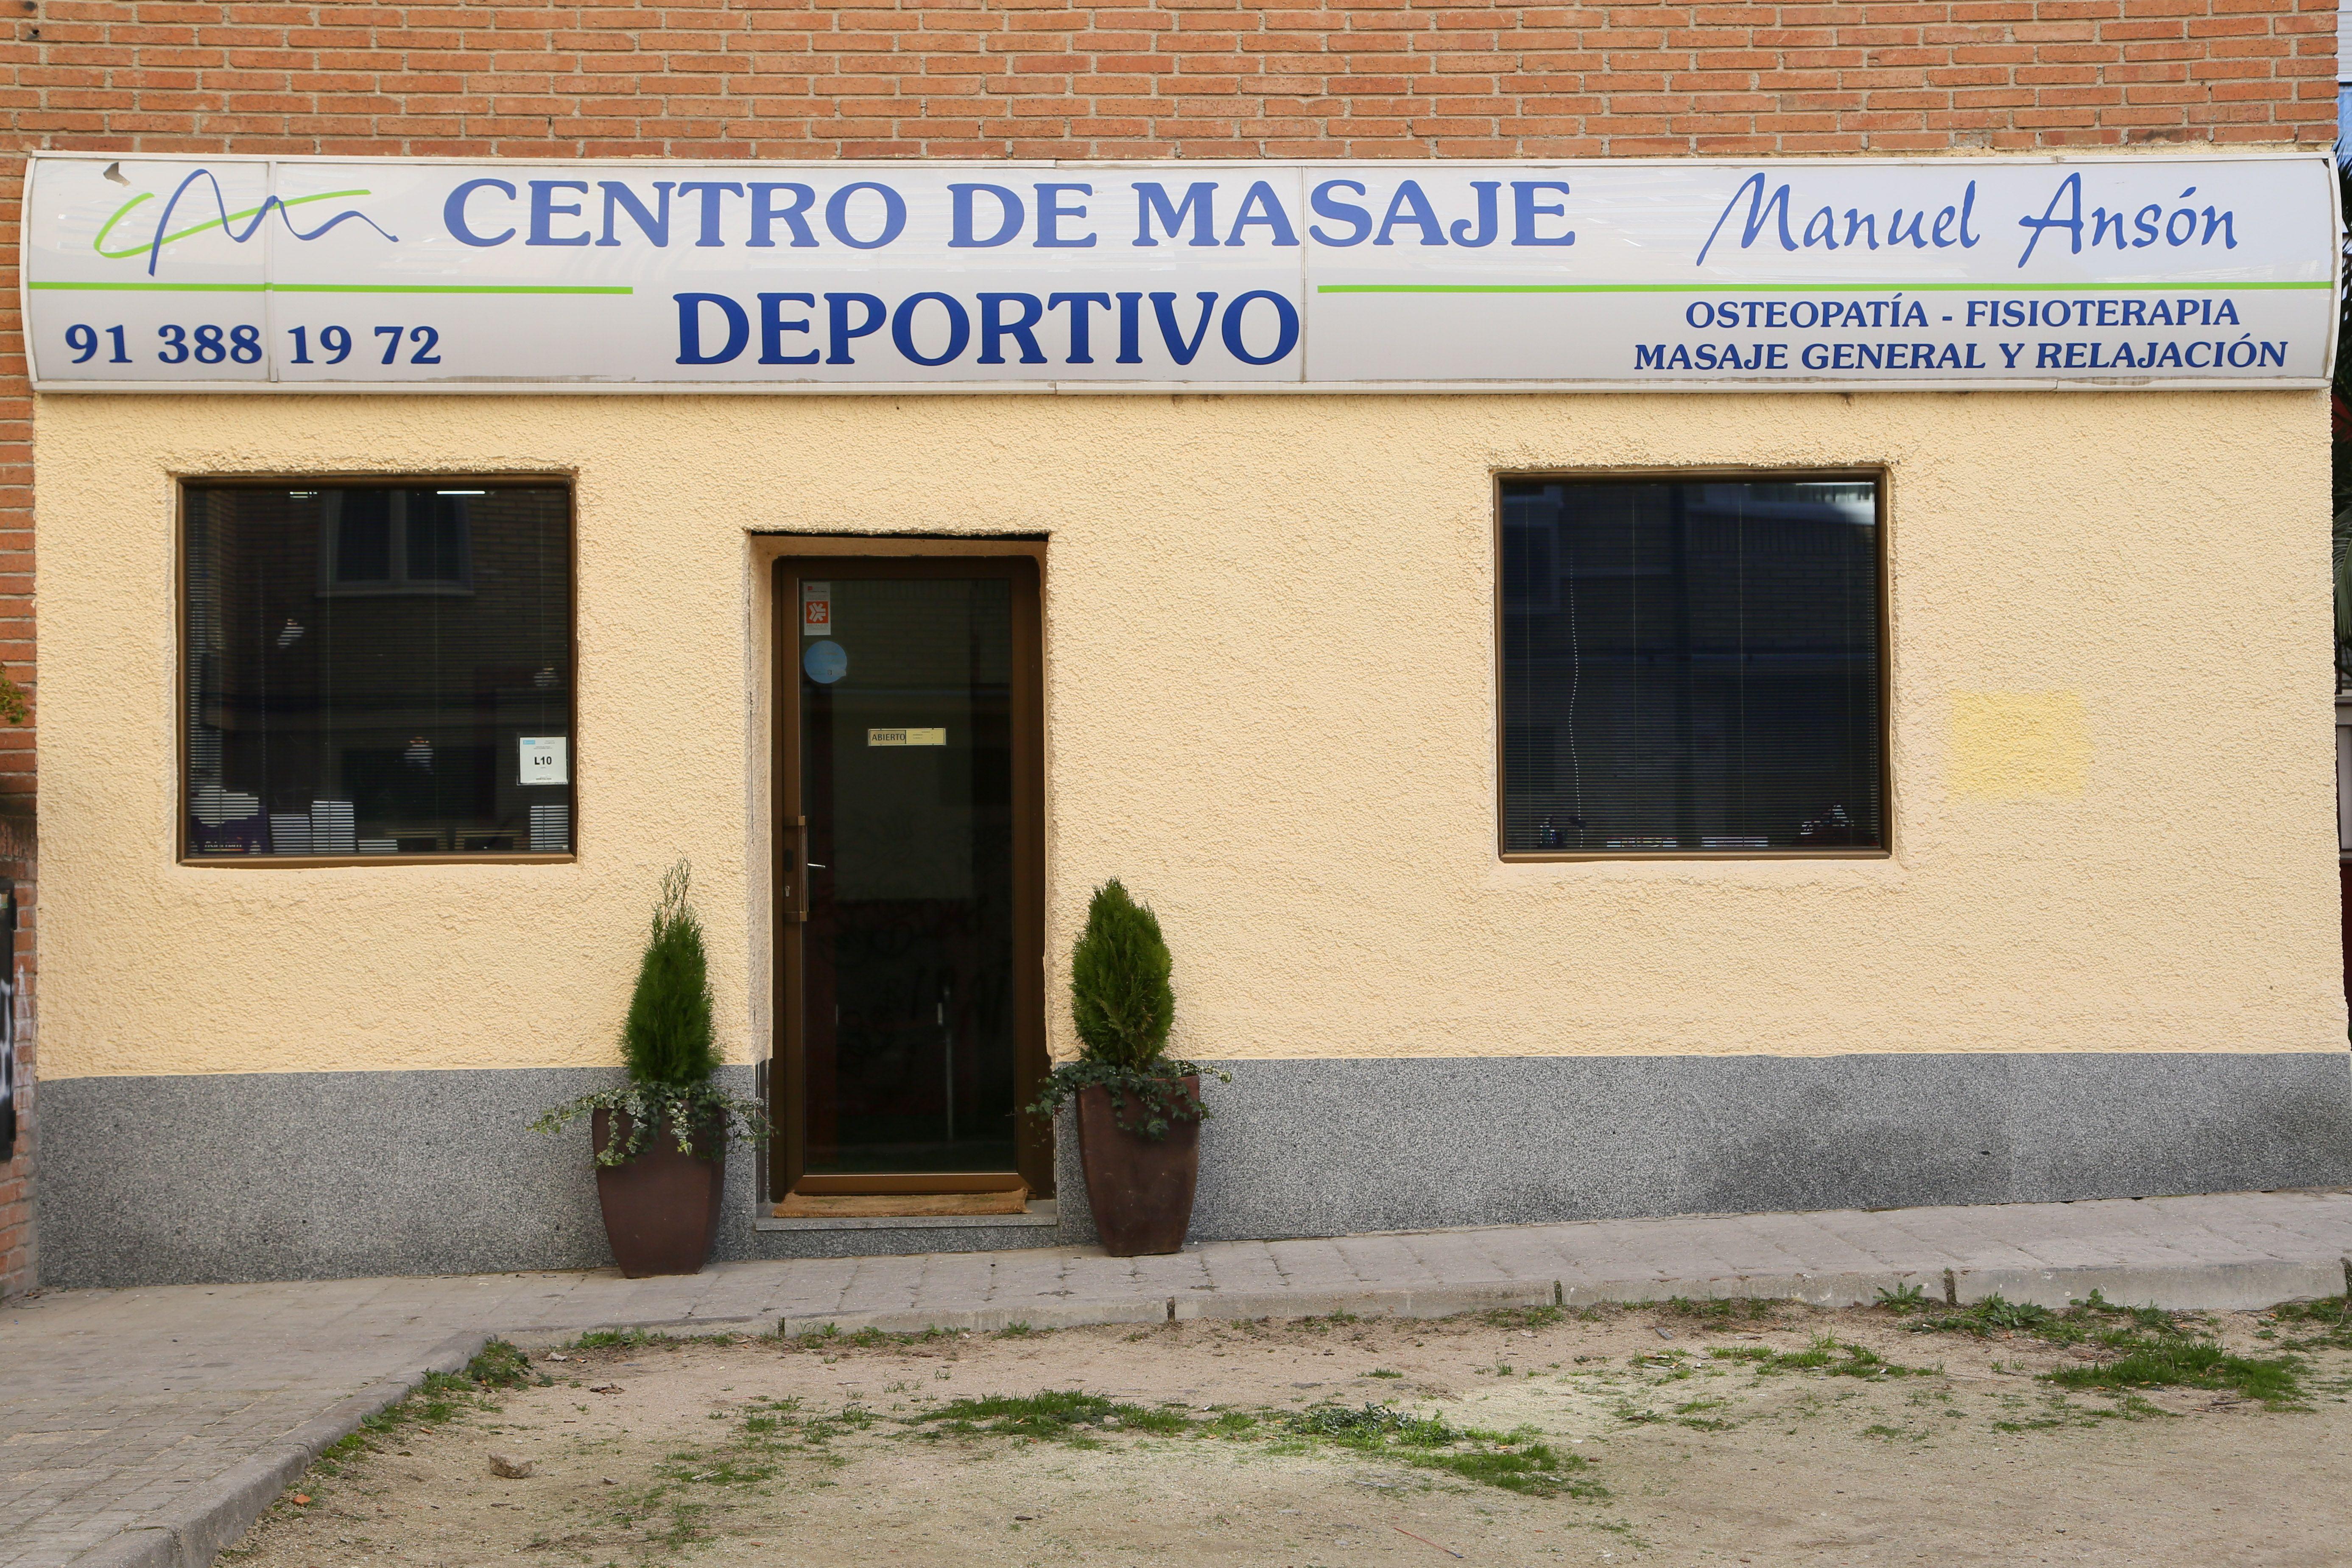 Foto 5 de Fisioterapia en Madrid | Ansón Manuel